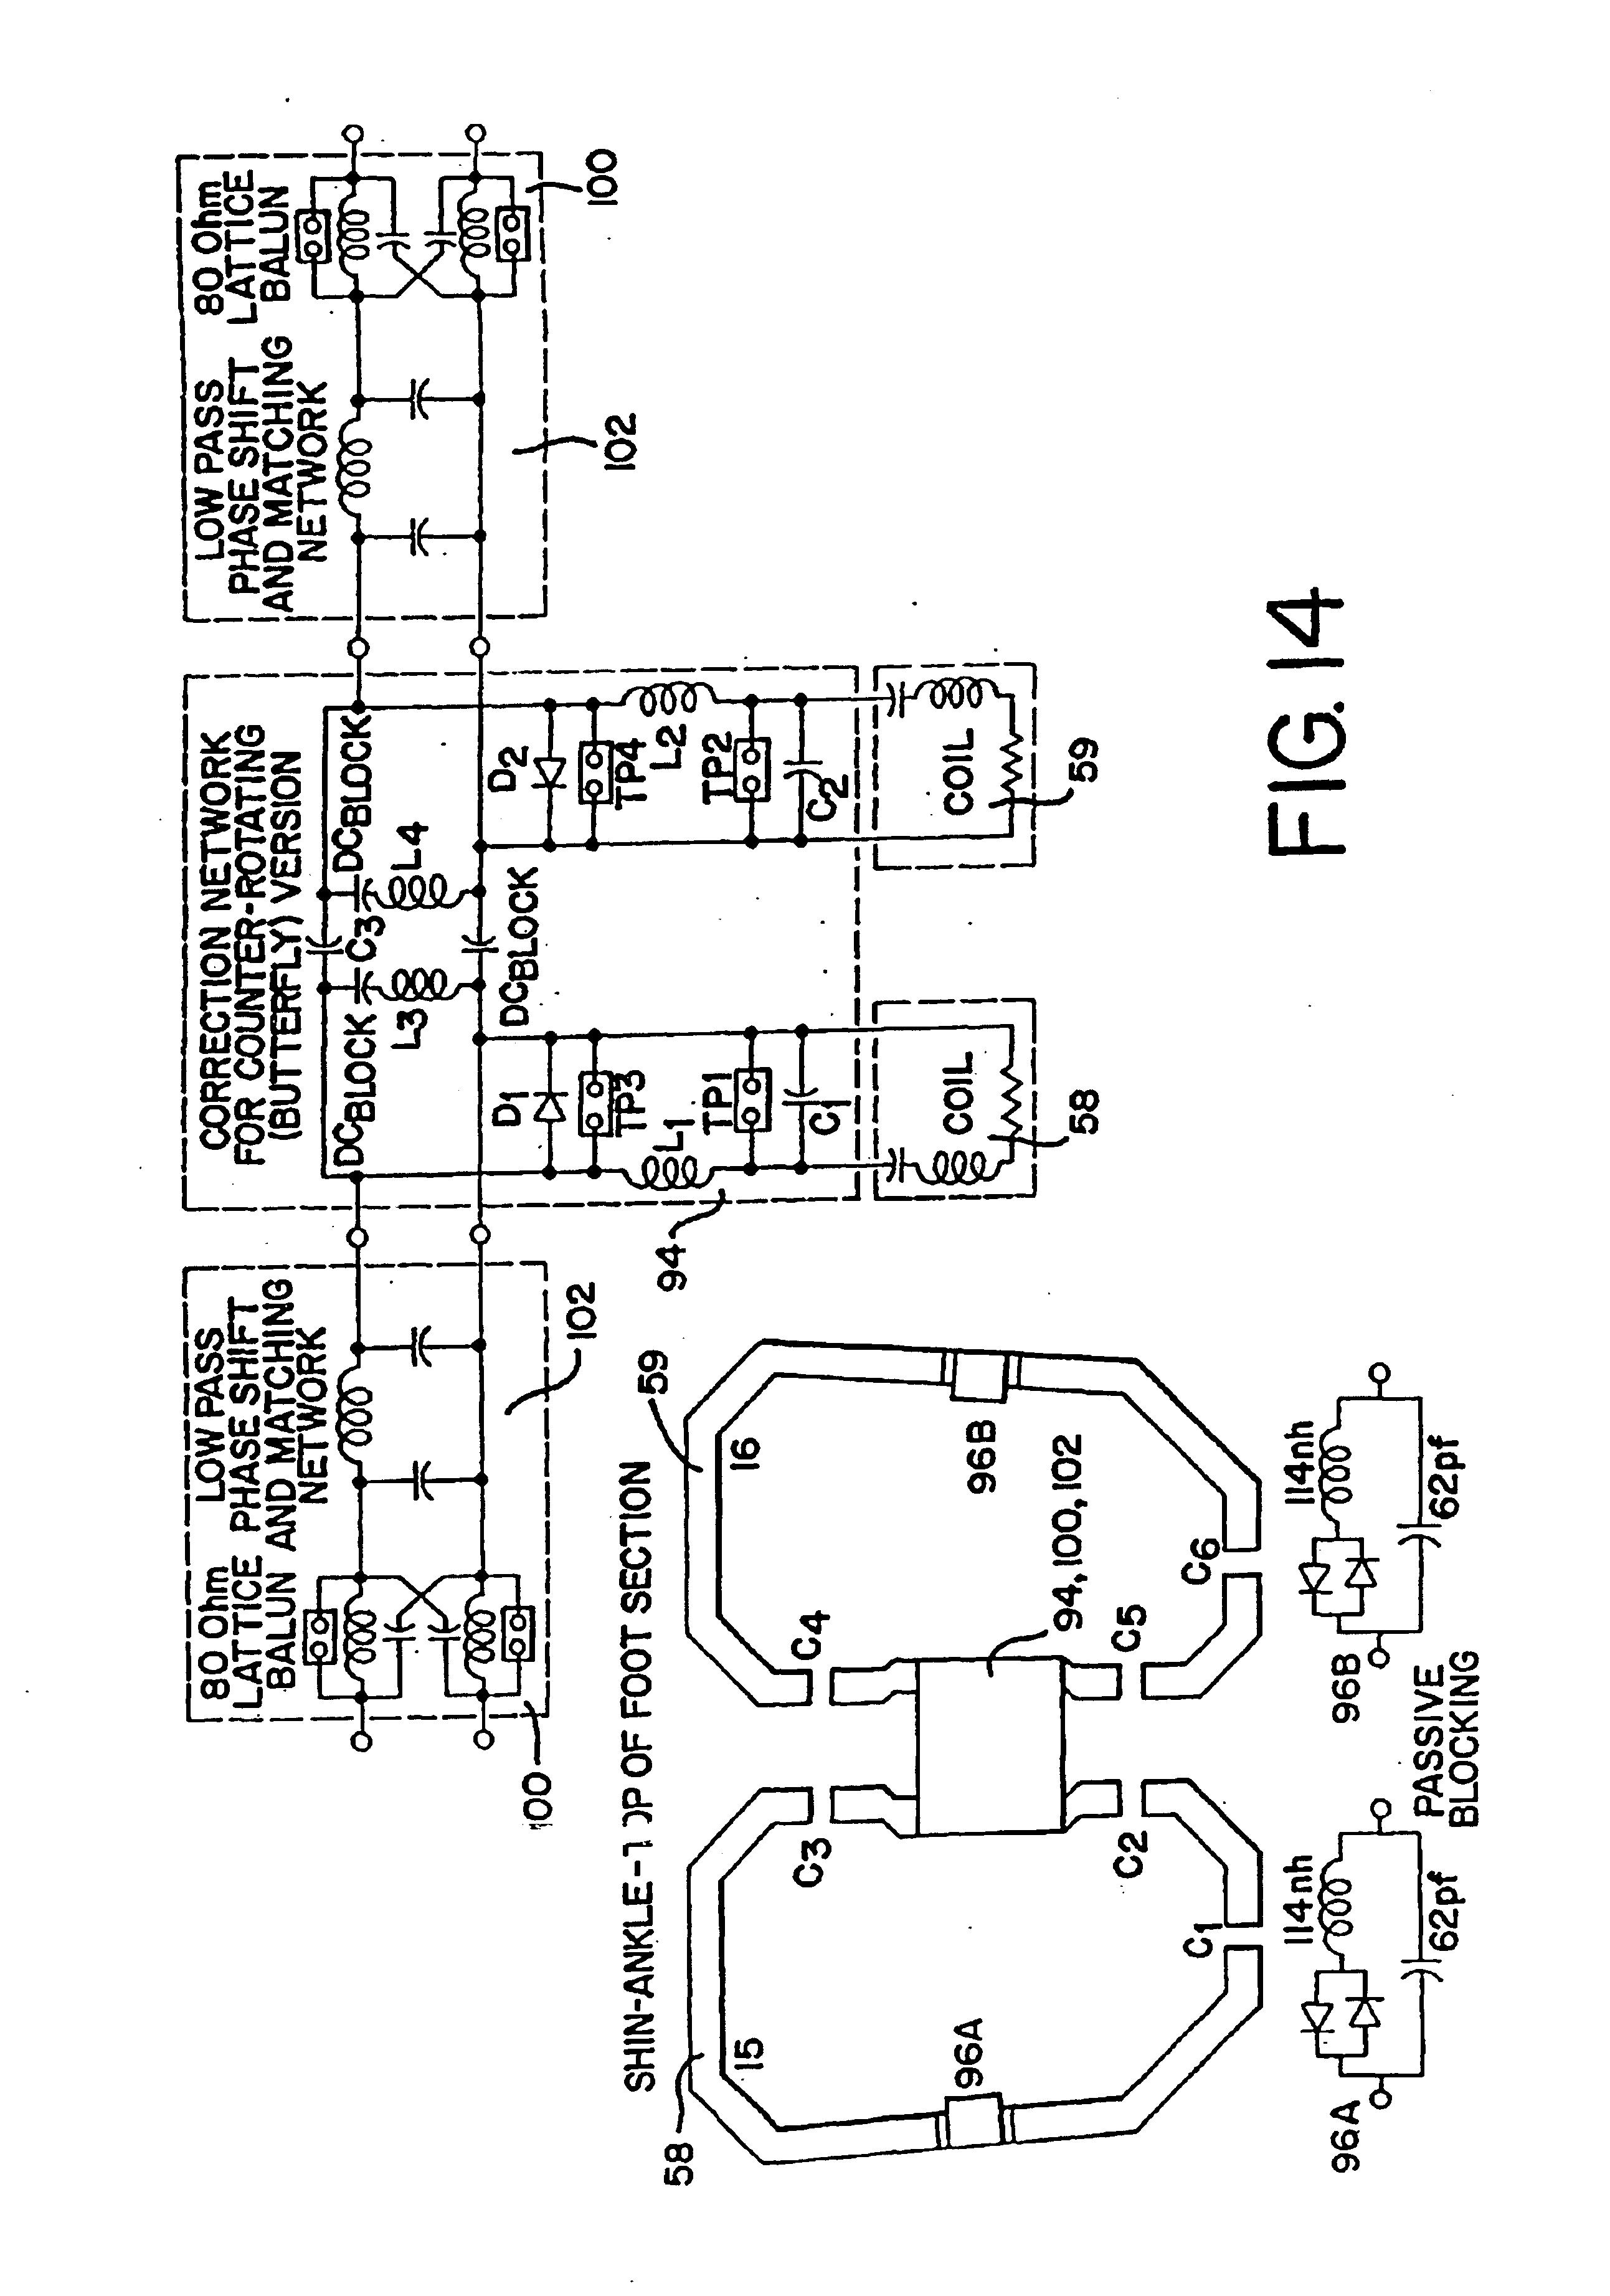 Miraculous Totem Pole Driver Circuit Auto Electrical Wiring Diagram Wiring Cloud Xempagosophoxytasticioscodnessplanboapumohammedshrineorg